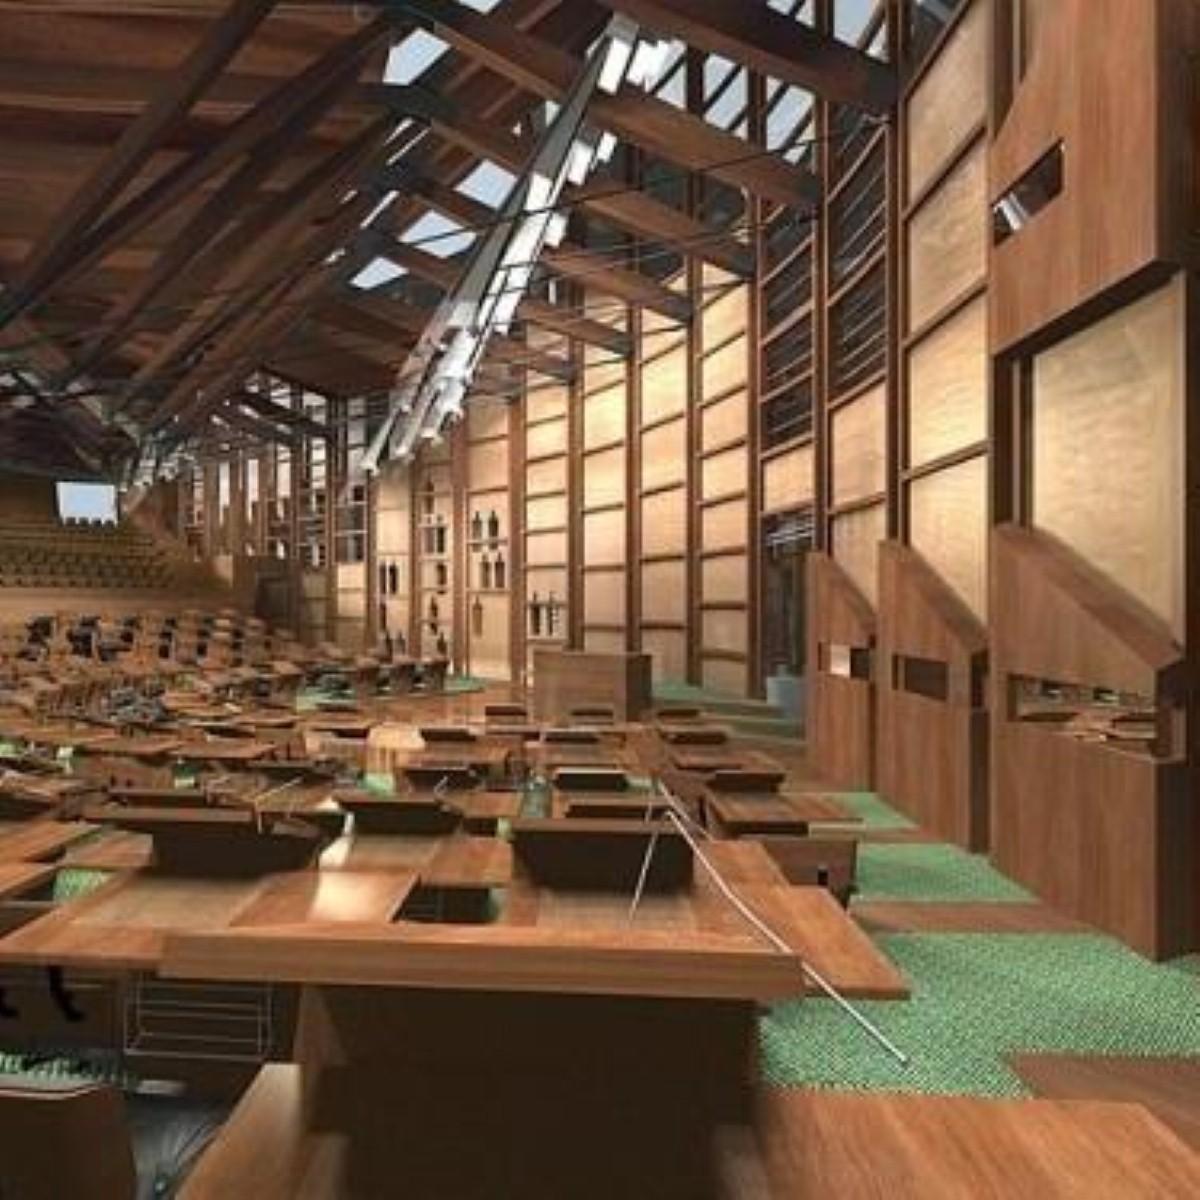 MSPs sworn in at Holyrood